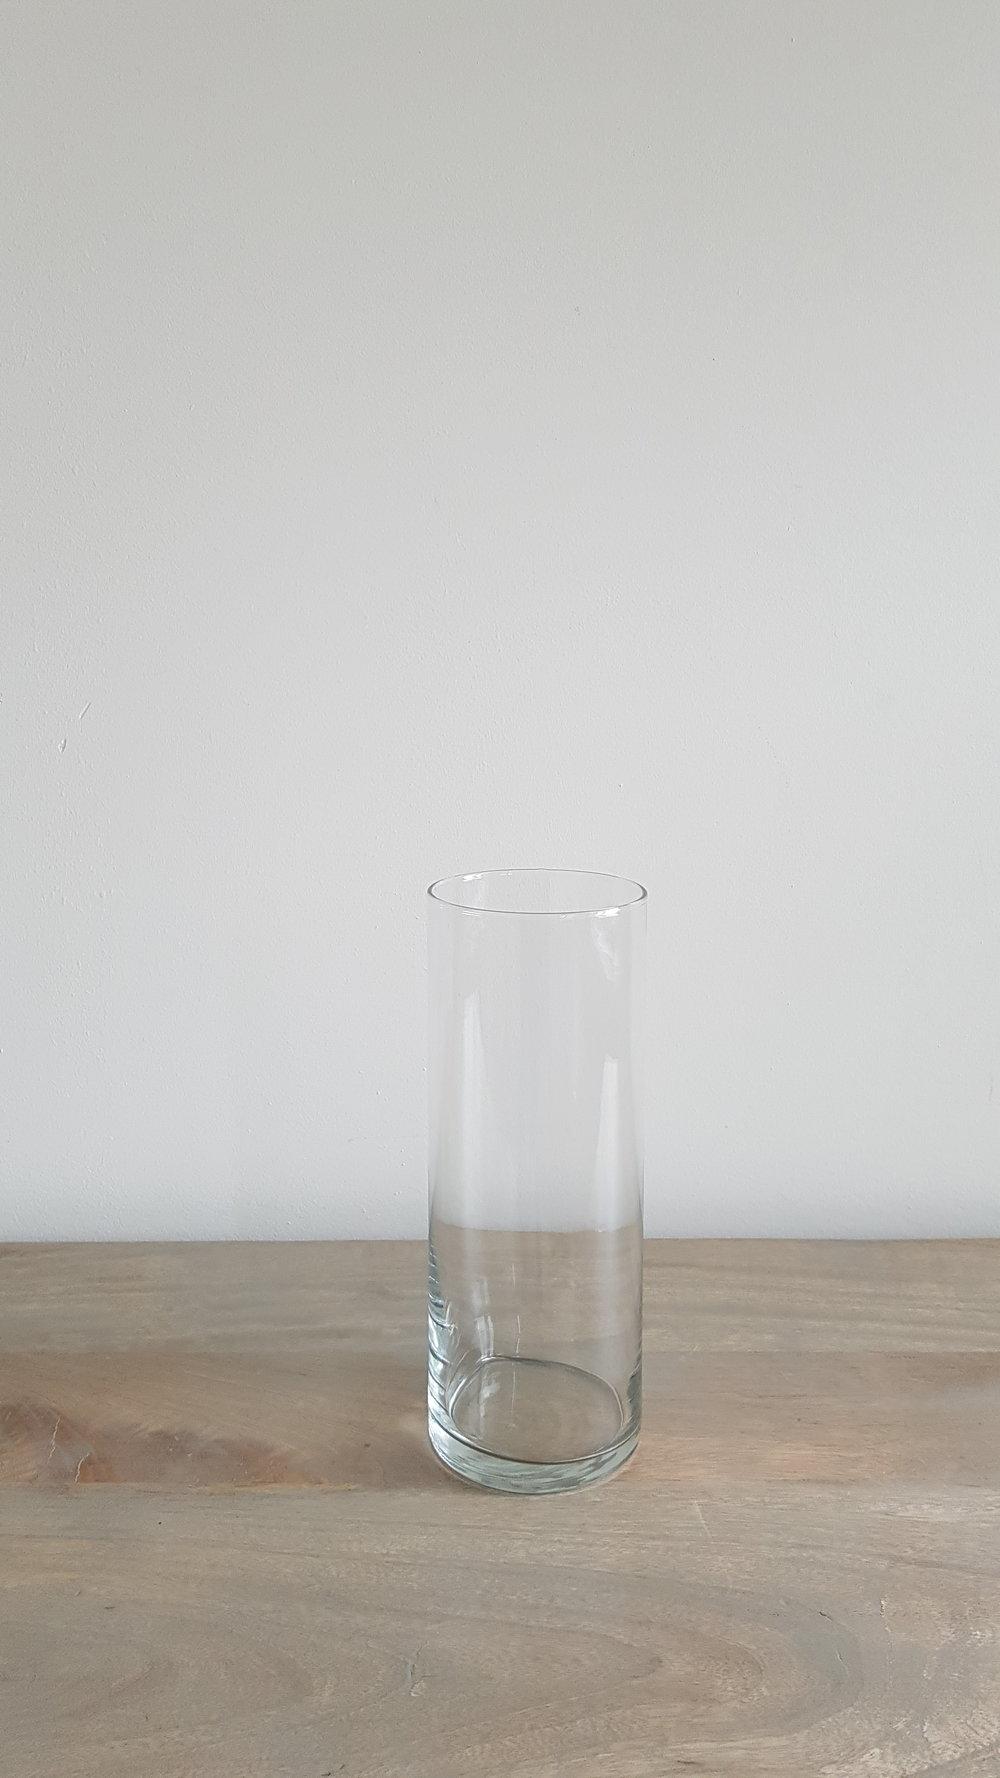 "9"" Glass Cylinder Vase - $1.75 each   Qty: 50"